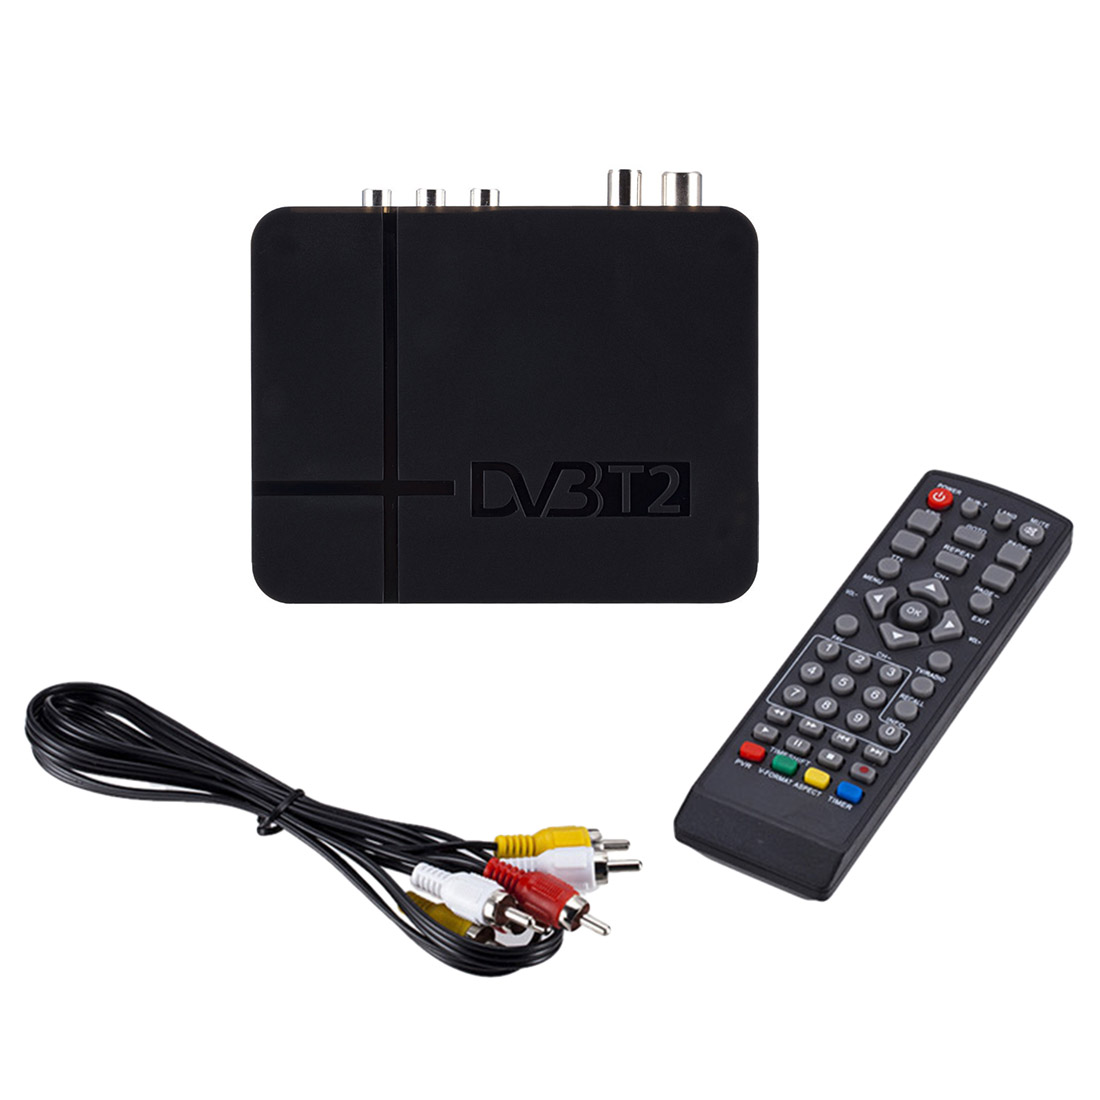 3D Интерфейс сигнала приемника ТВ DVB T цифрового ресивера DVB T2/H.264 таймер поддерживает для Dolby